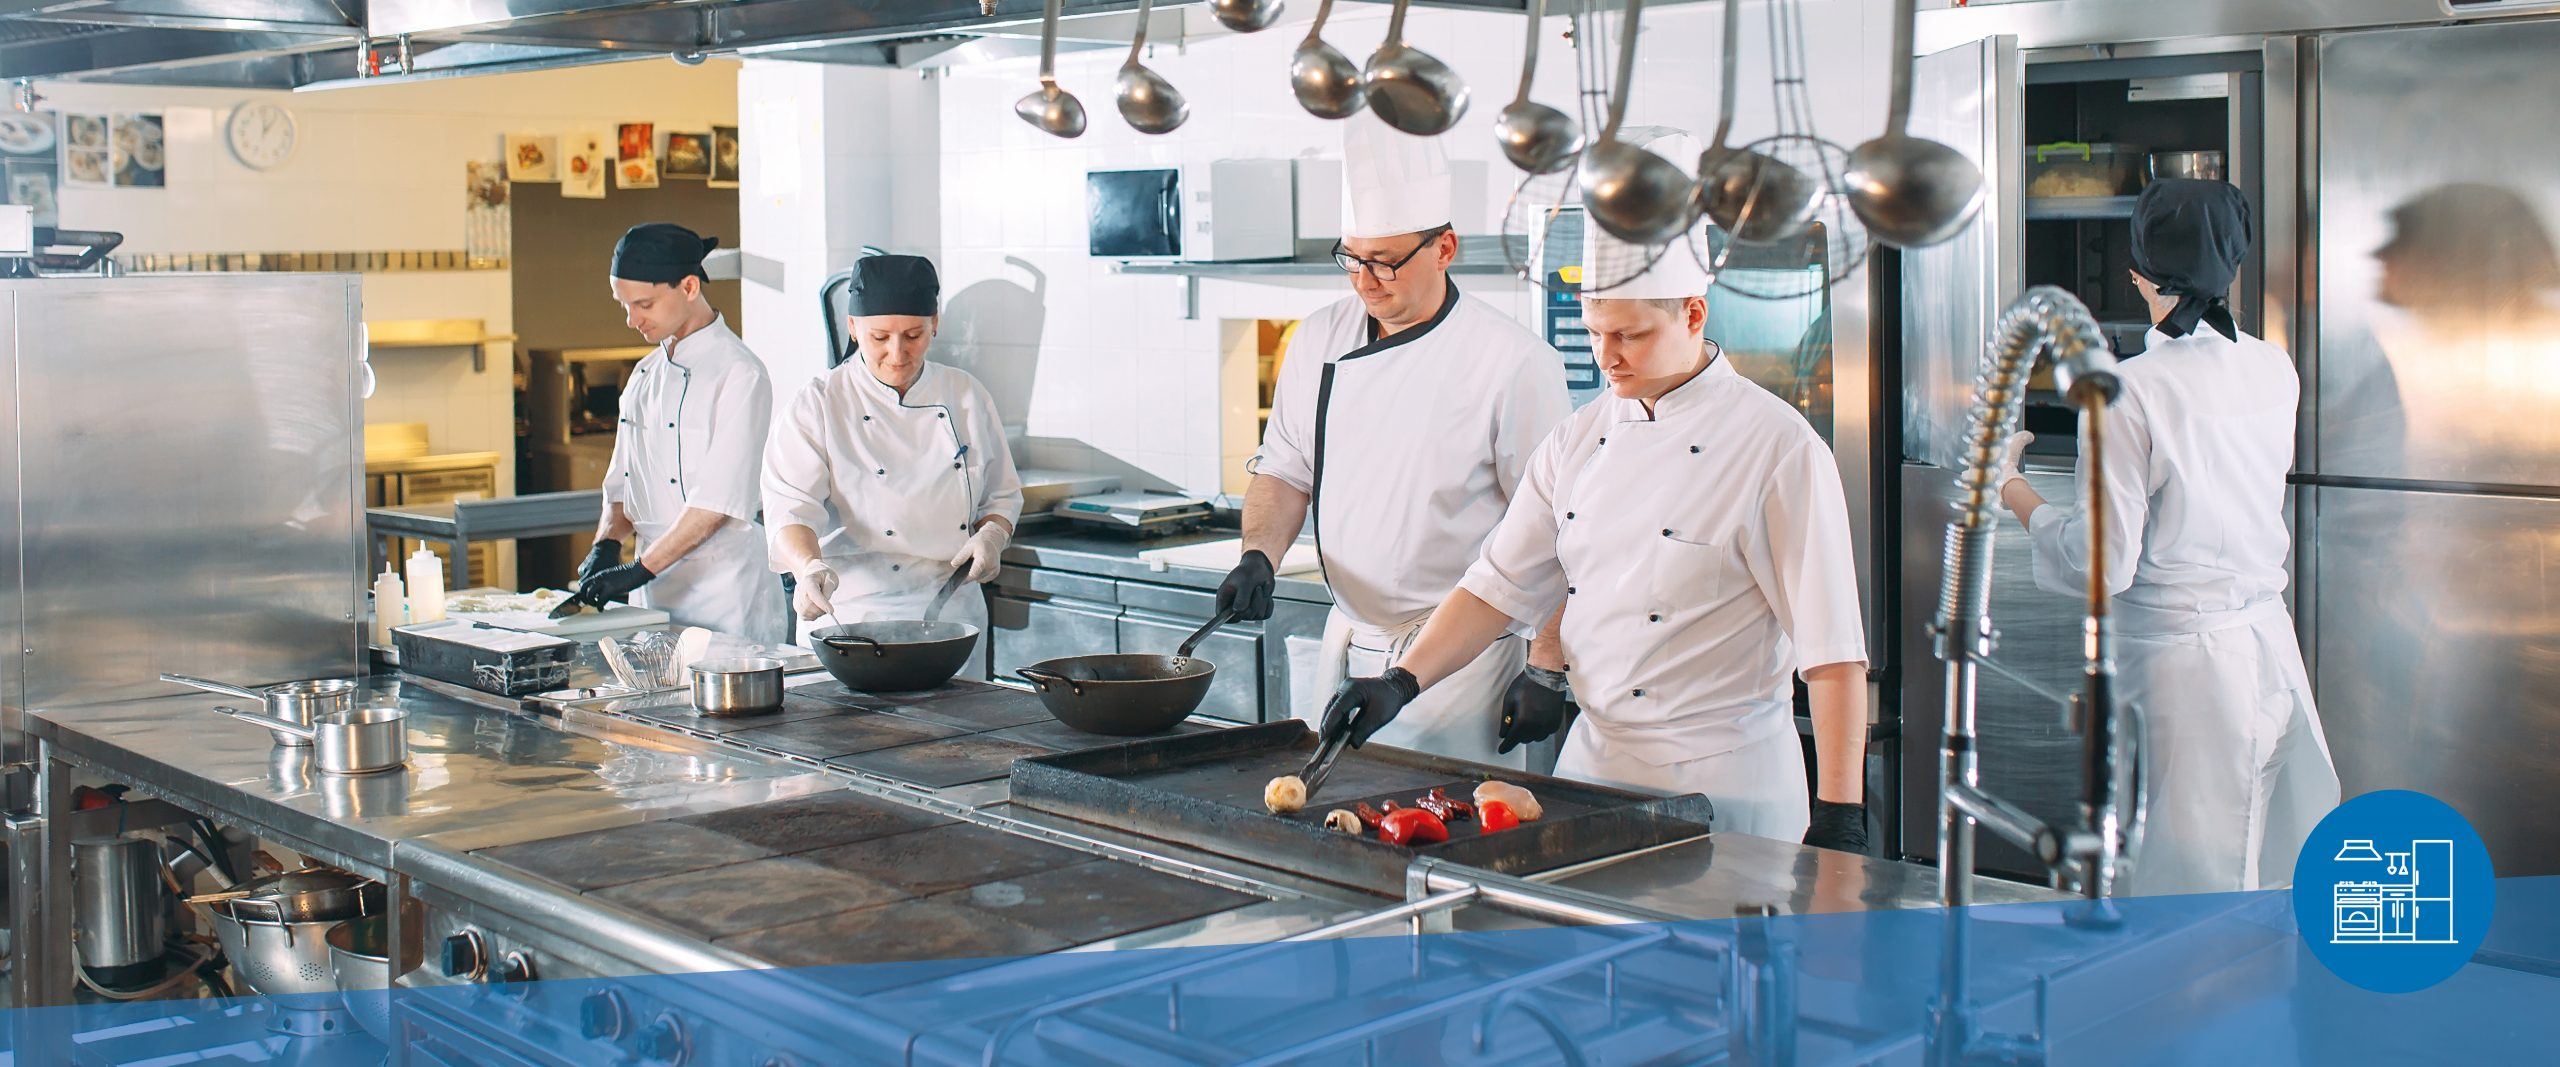 Pudol Titelbild Lebensmittelindustrie & Gastronomie